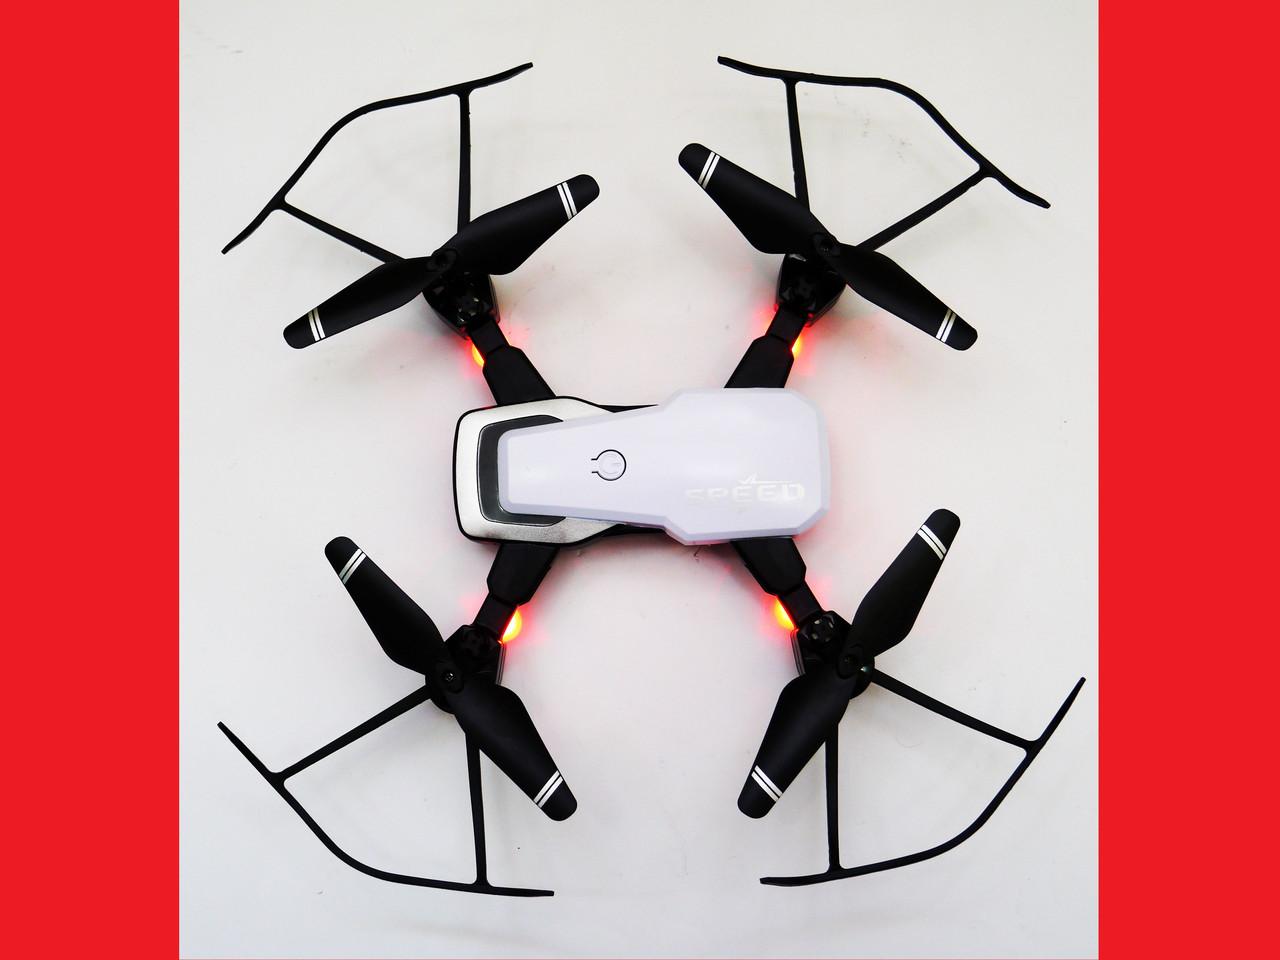 Квадрокоптер Lurker GD885HW c WiFi камерою